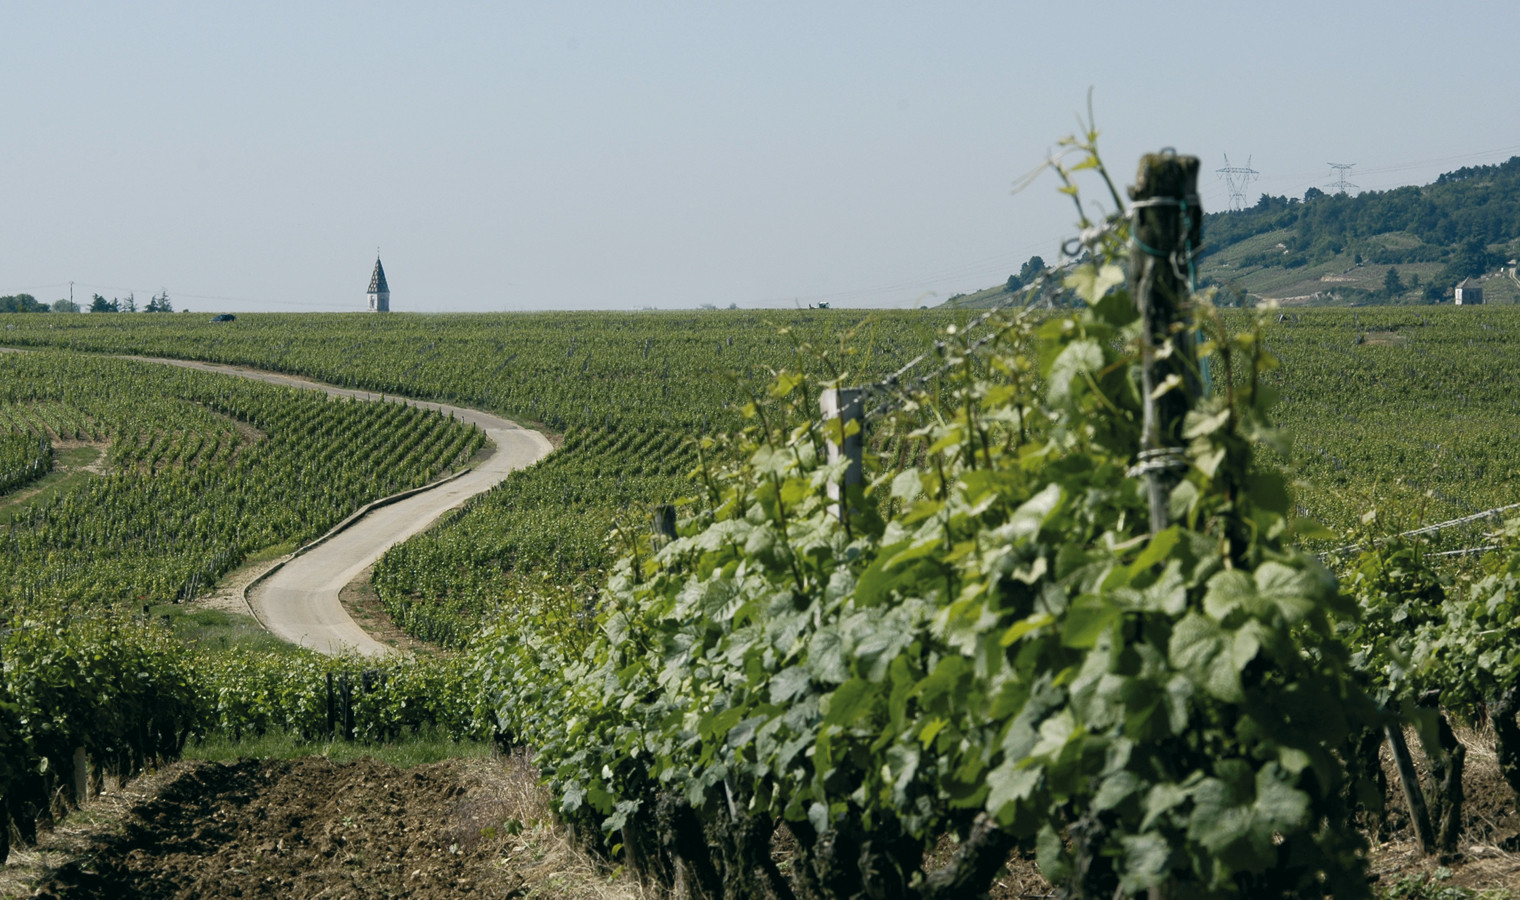 C te d or burgundy golden vineyards wine tasting relaxation le splendide voyage - The splendid transformation of a vineyard in burgundy ...